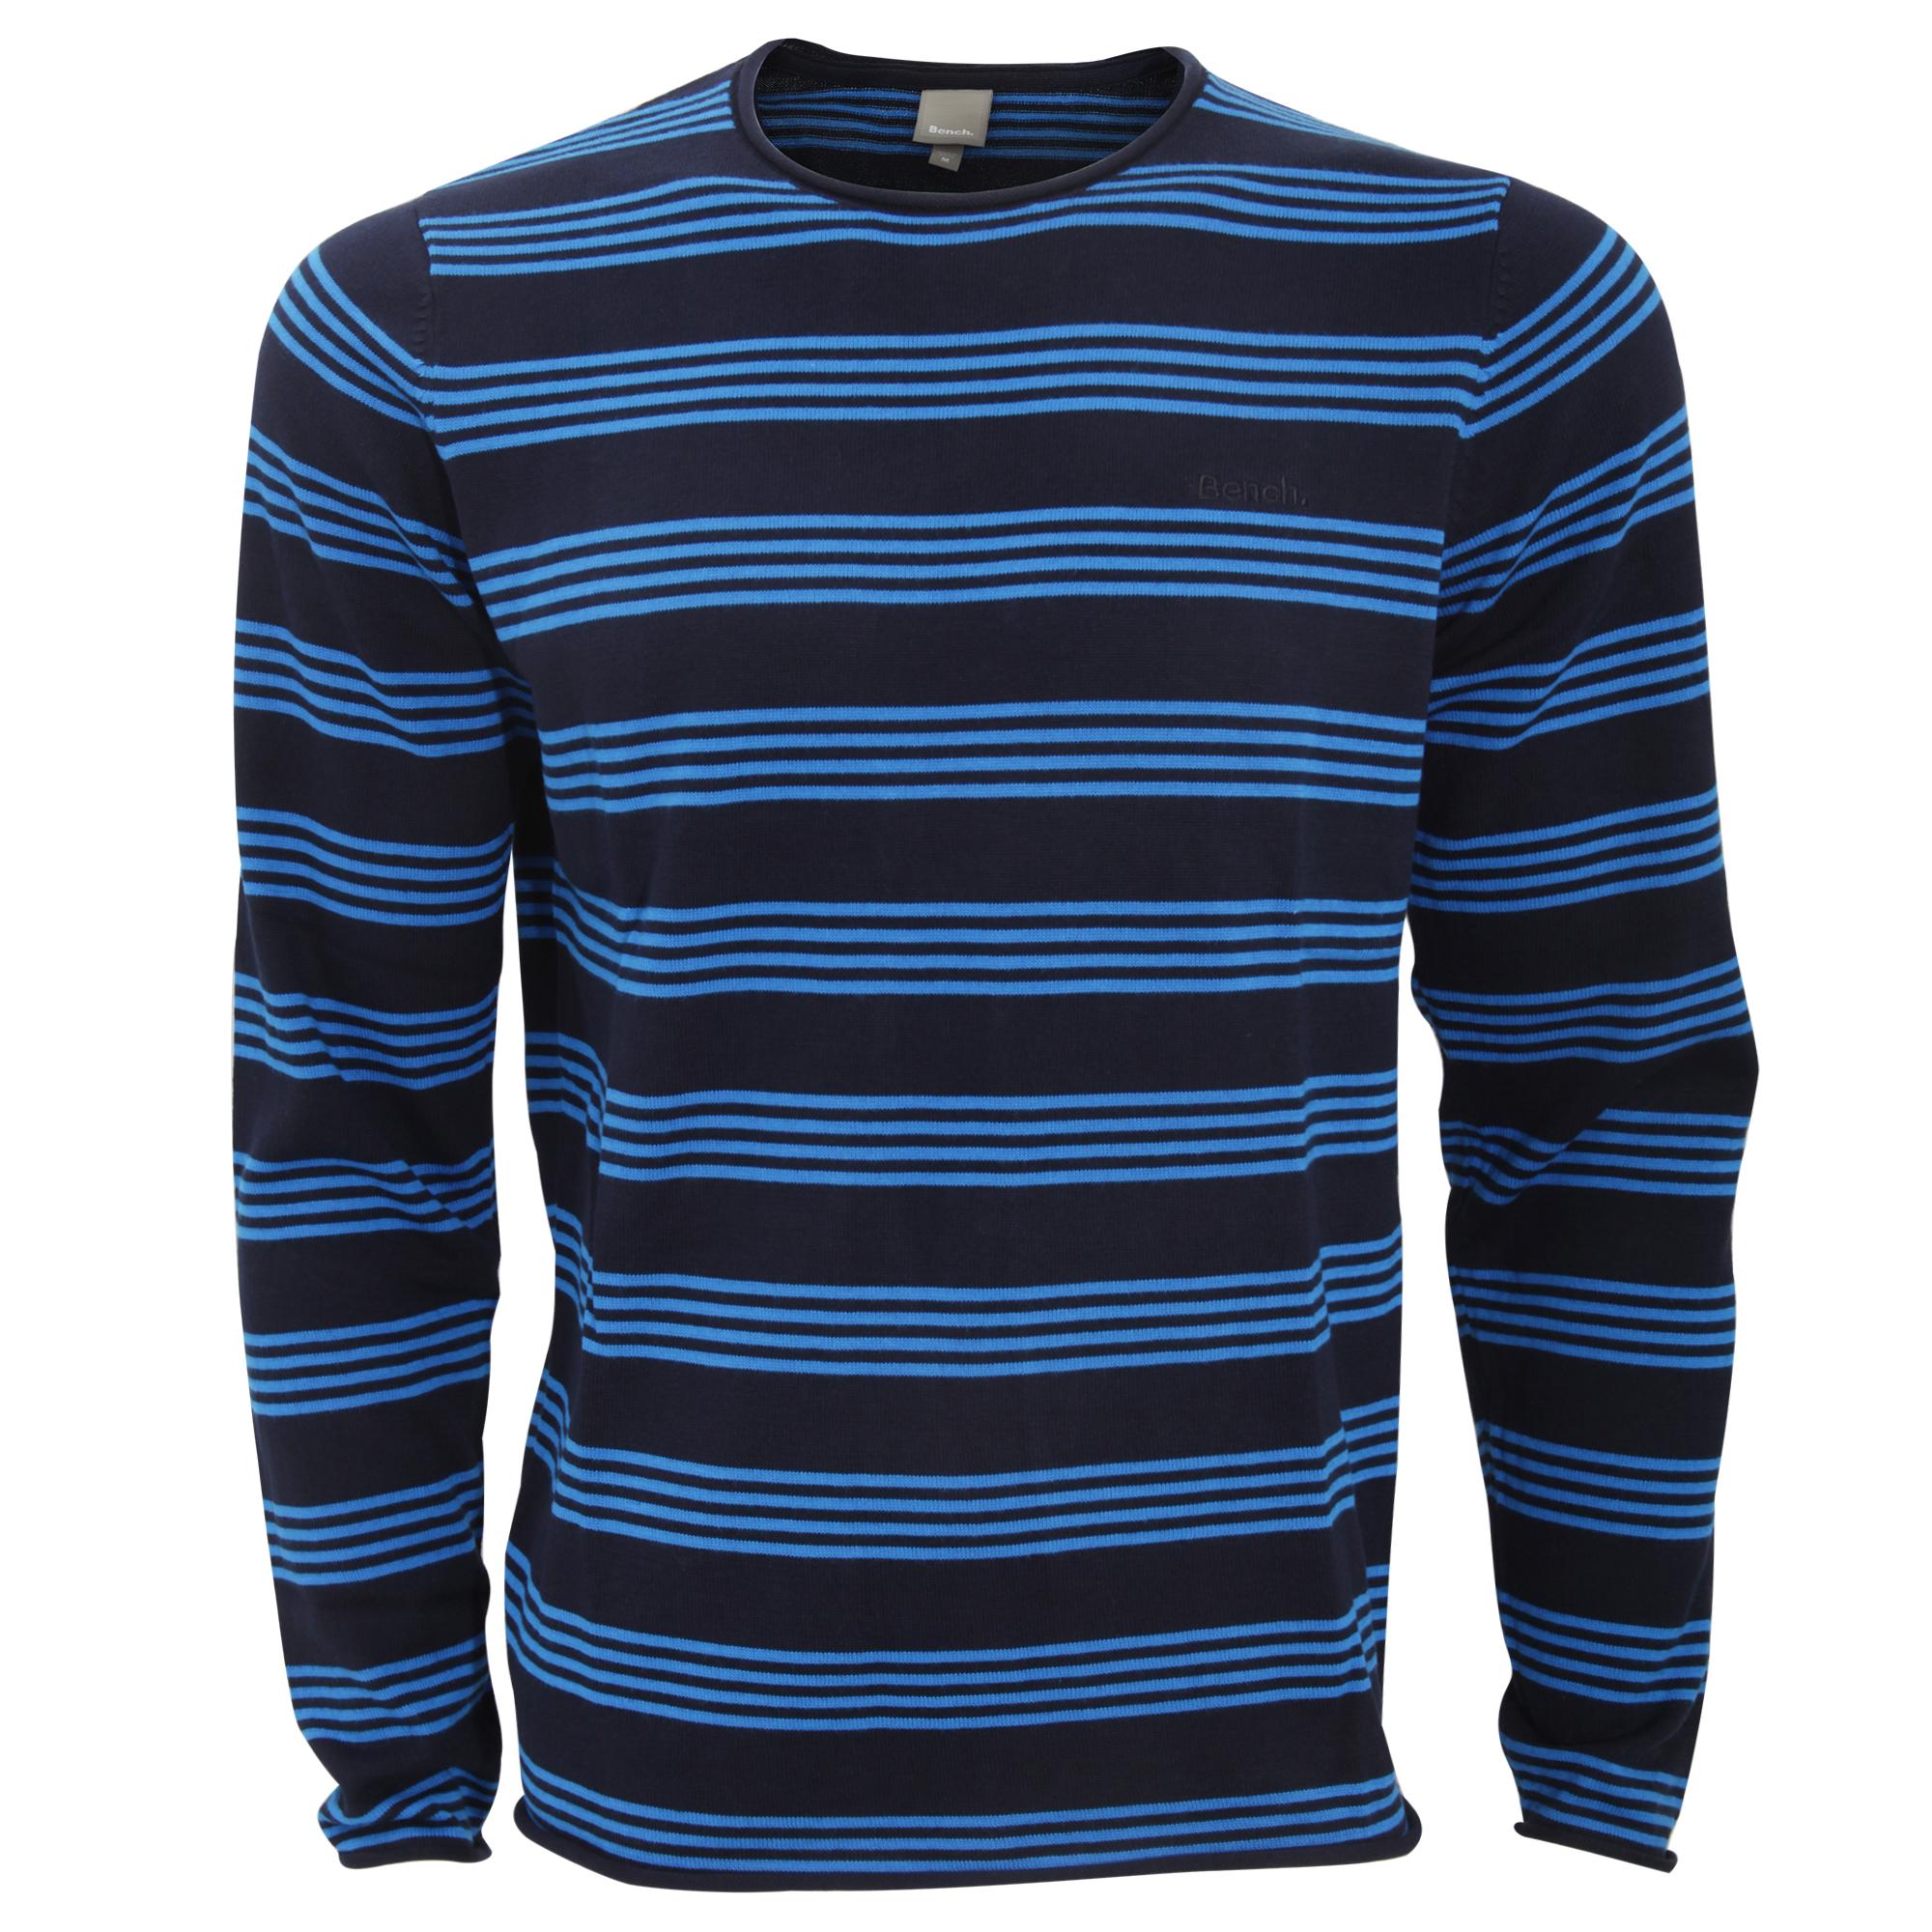 bench herren adour langarm streifen pullover sweater ebay. Black Bedroom Furniture Sets. Home Design Ideas